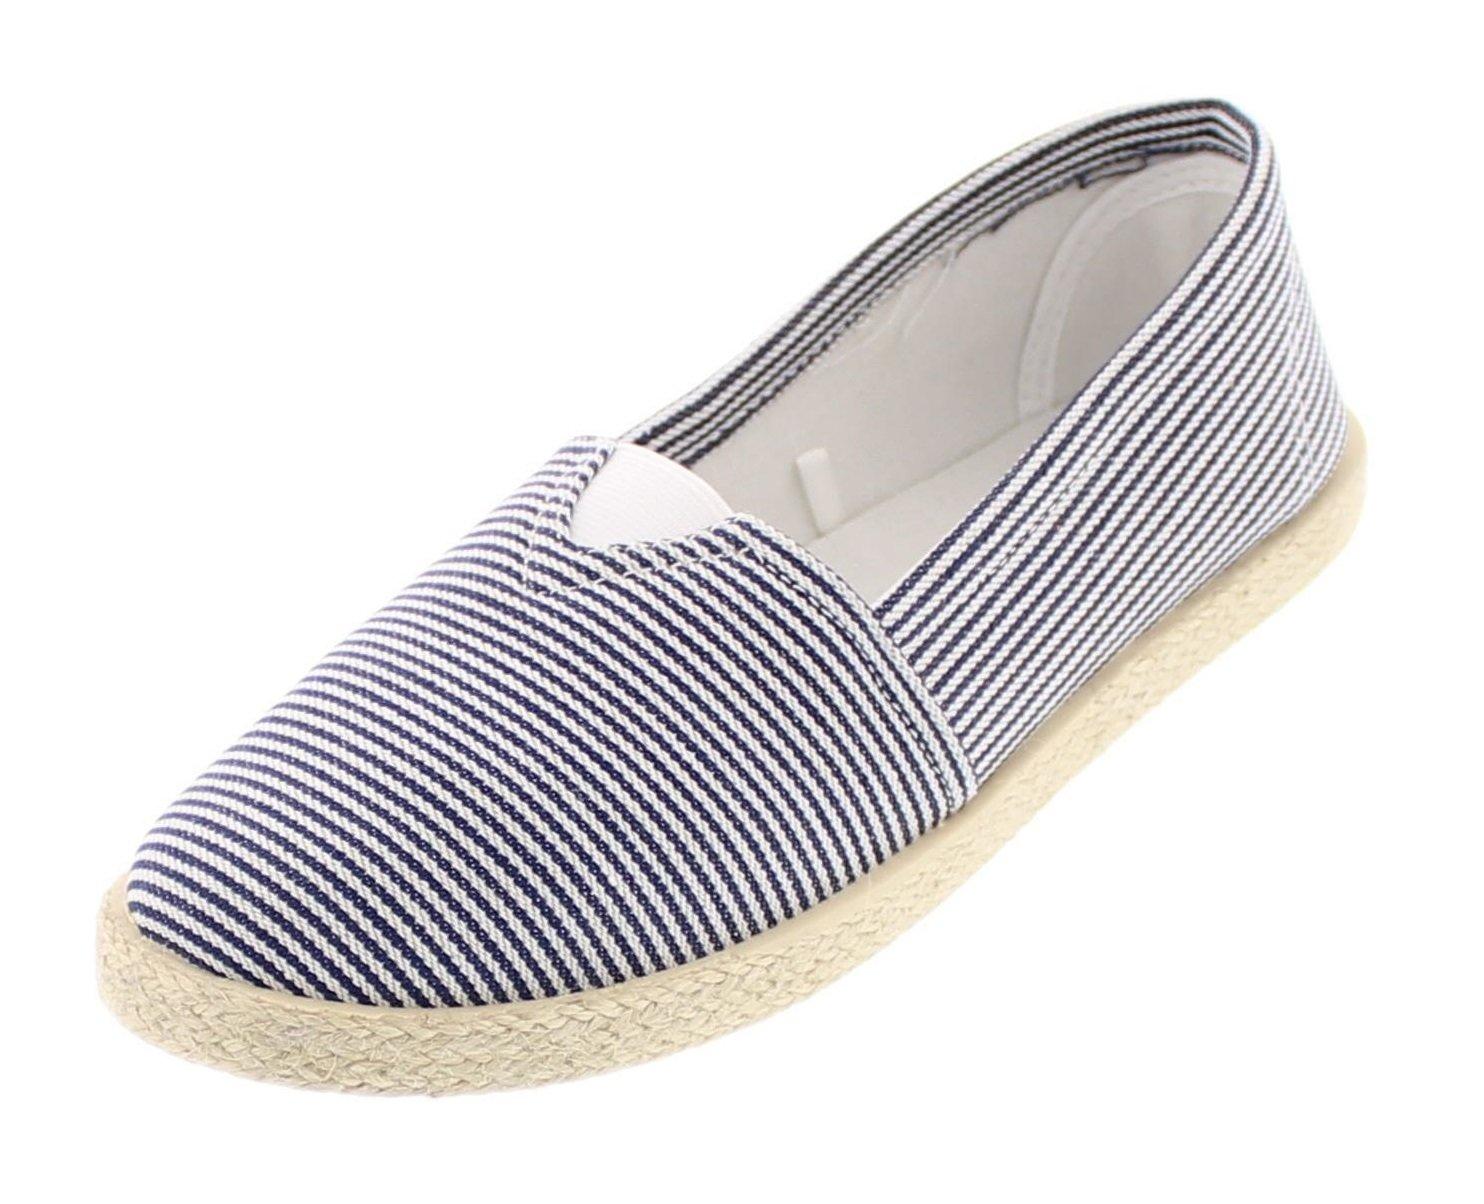 Gold Toe Women's Delphie Canvas Alpargatas Espadrille Flat Casual Summer Style Comfy Slip On Walking Shoe B077RJHGBX 10 B(M) US|Navy